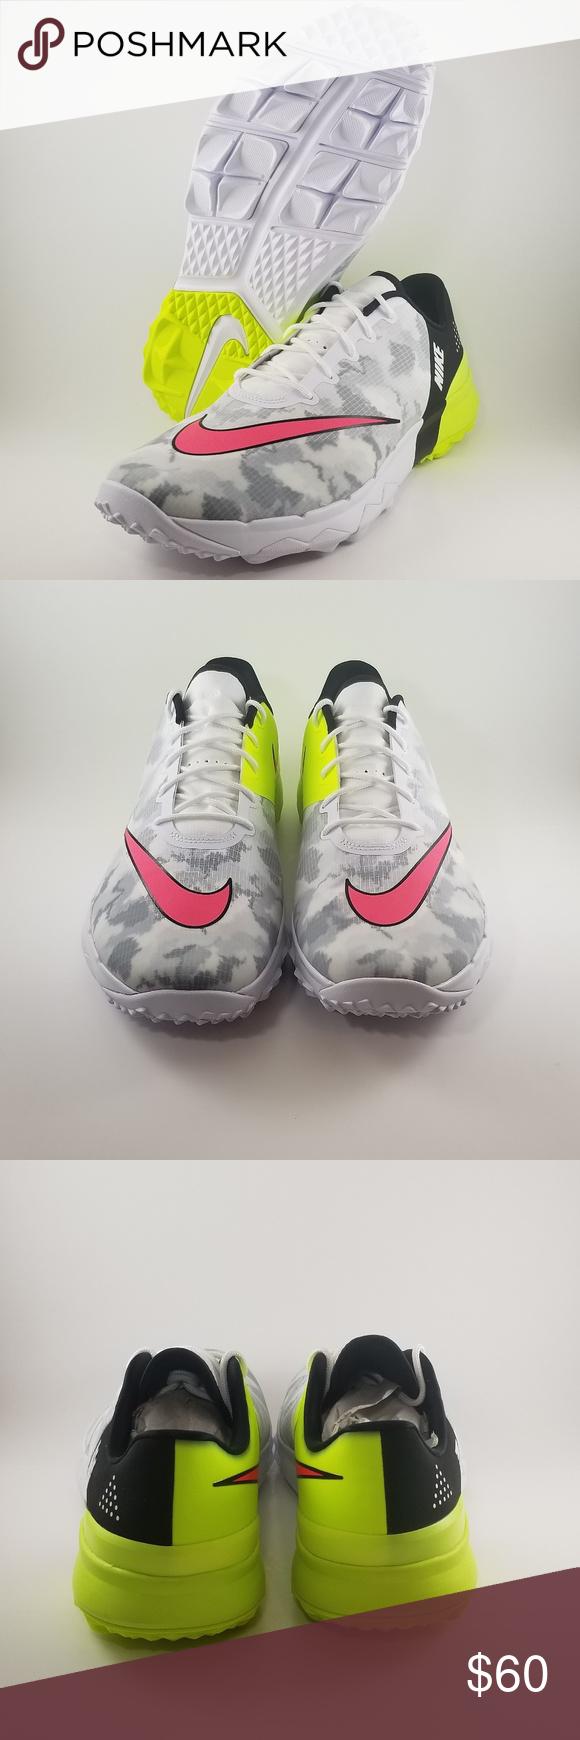 500982209d1a Nike FI Flex Golf Shoe Nike FI Flex Golf Shoe Color  White Racer Pink